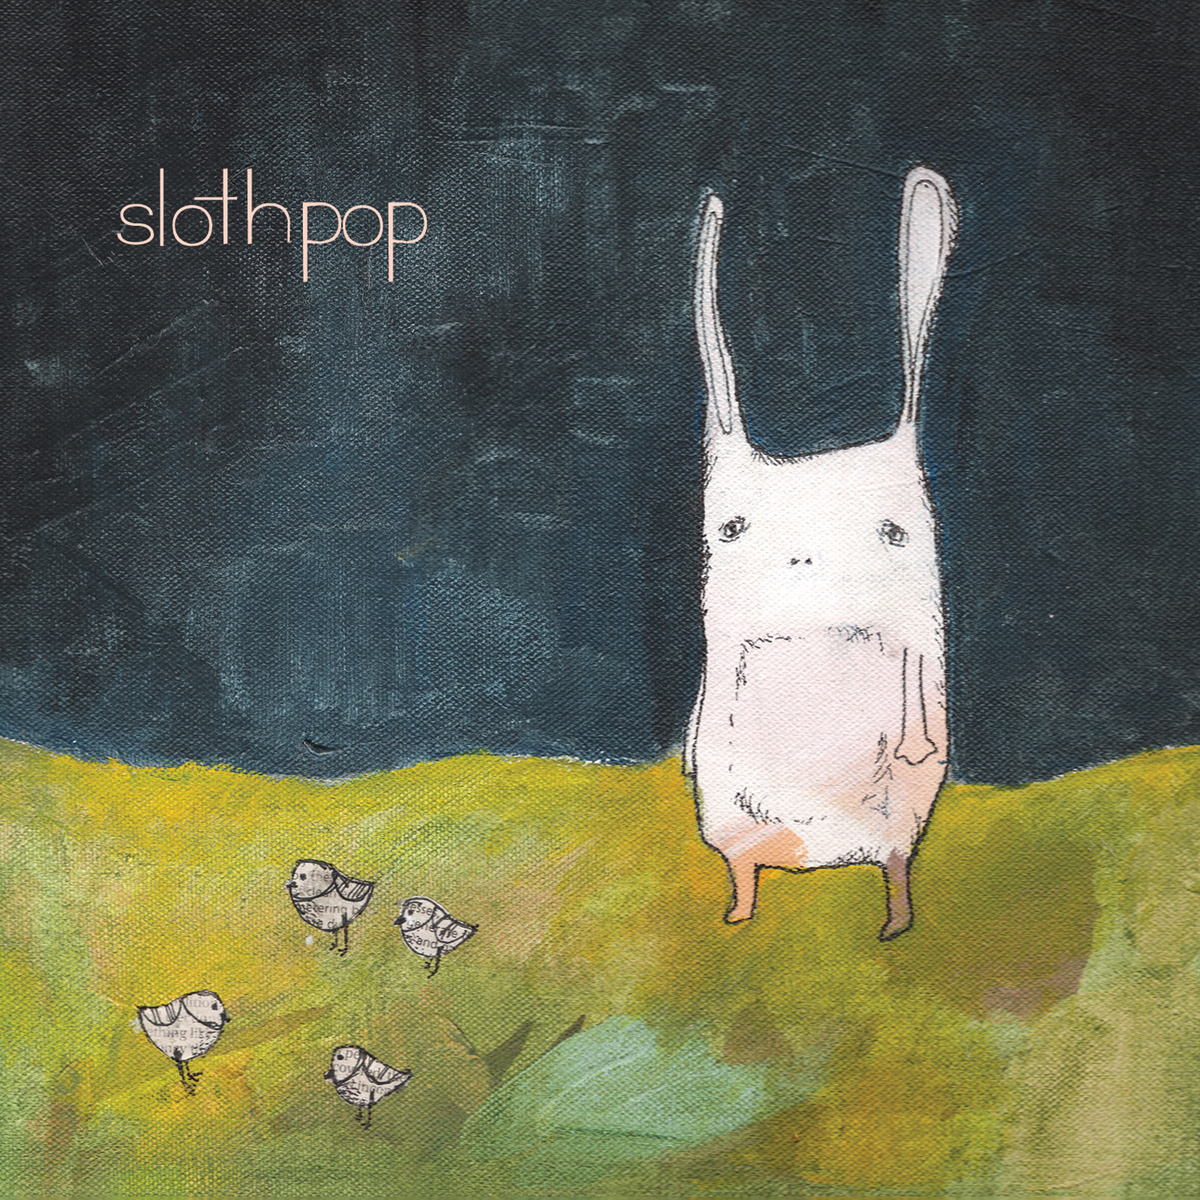 Slothpop – One